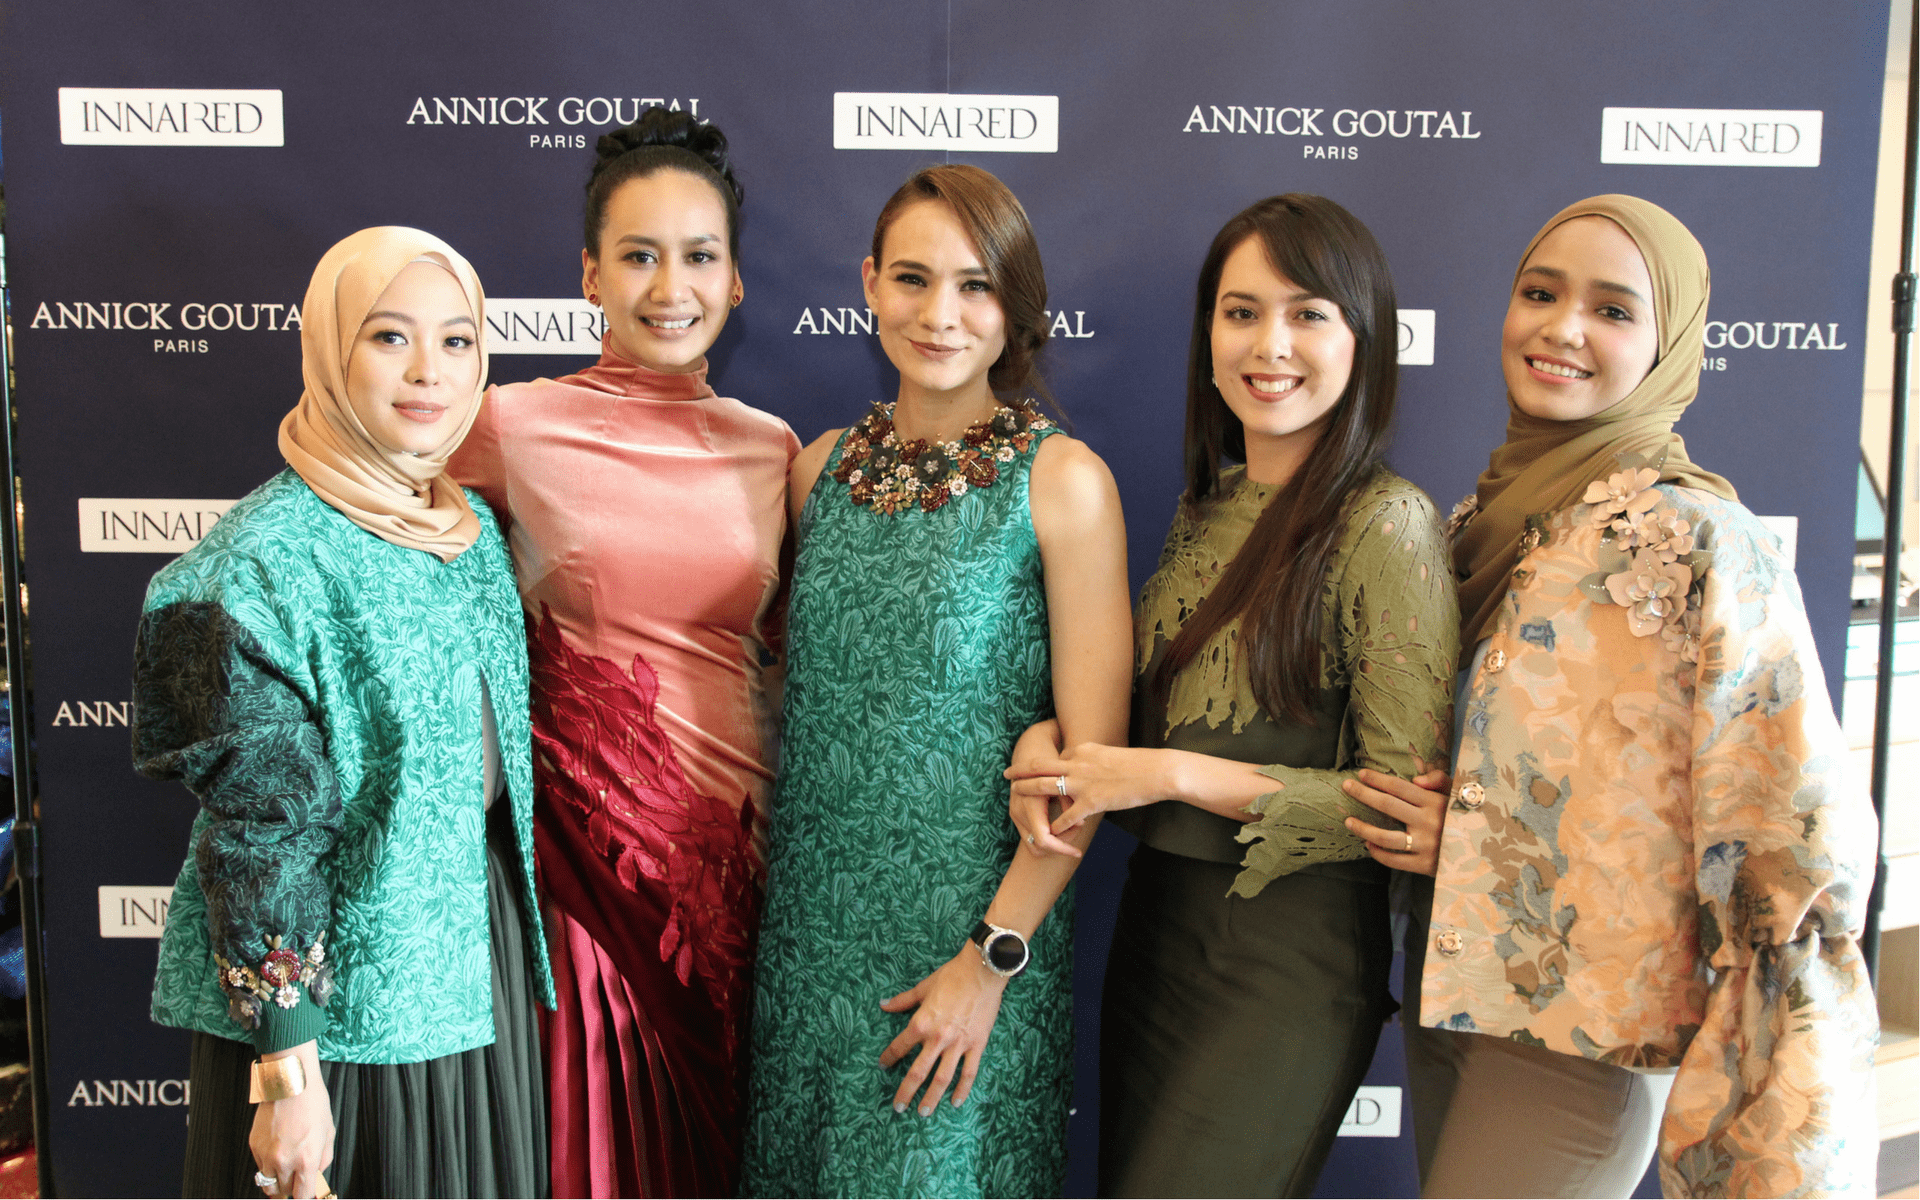 Datin Vivy Yusof, Marsha Milan, Aishah Sinclair, Siti Saleha and Ummi Nazeera